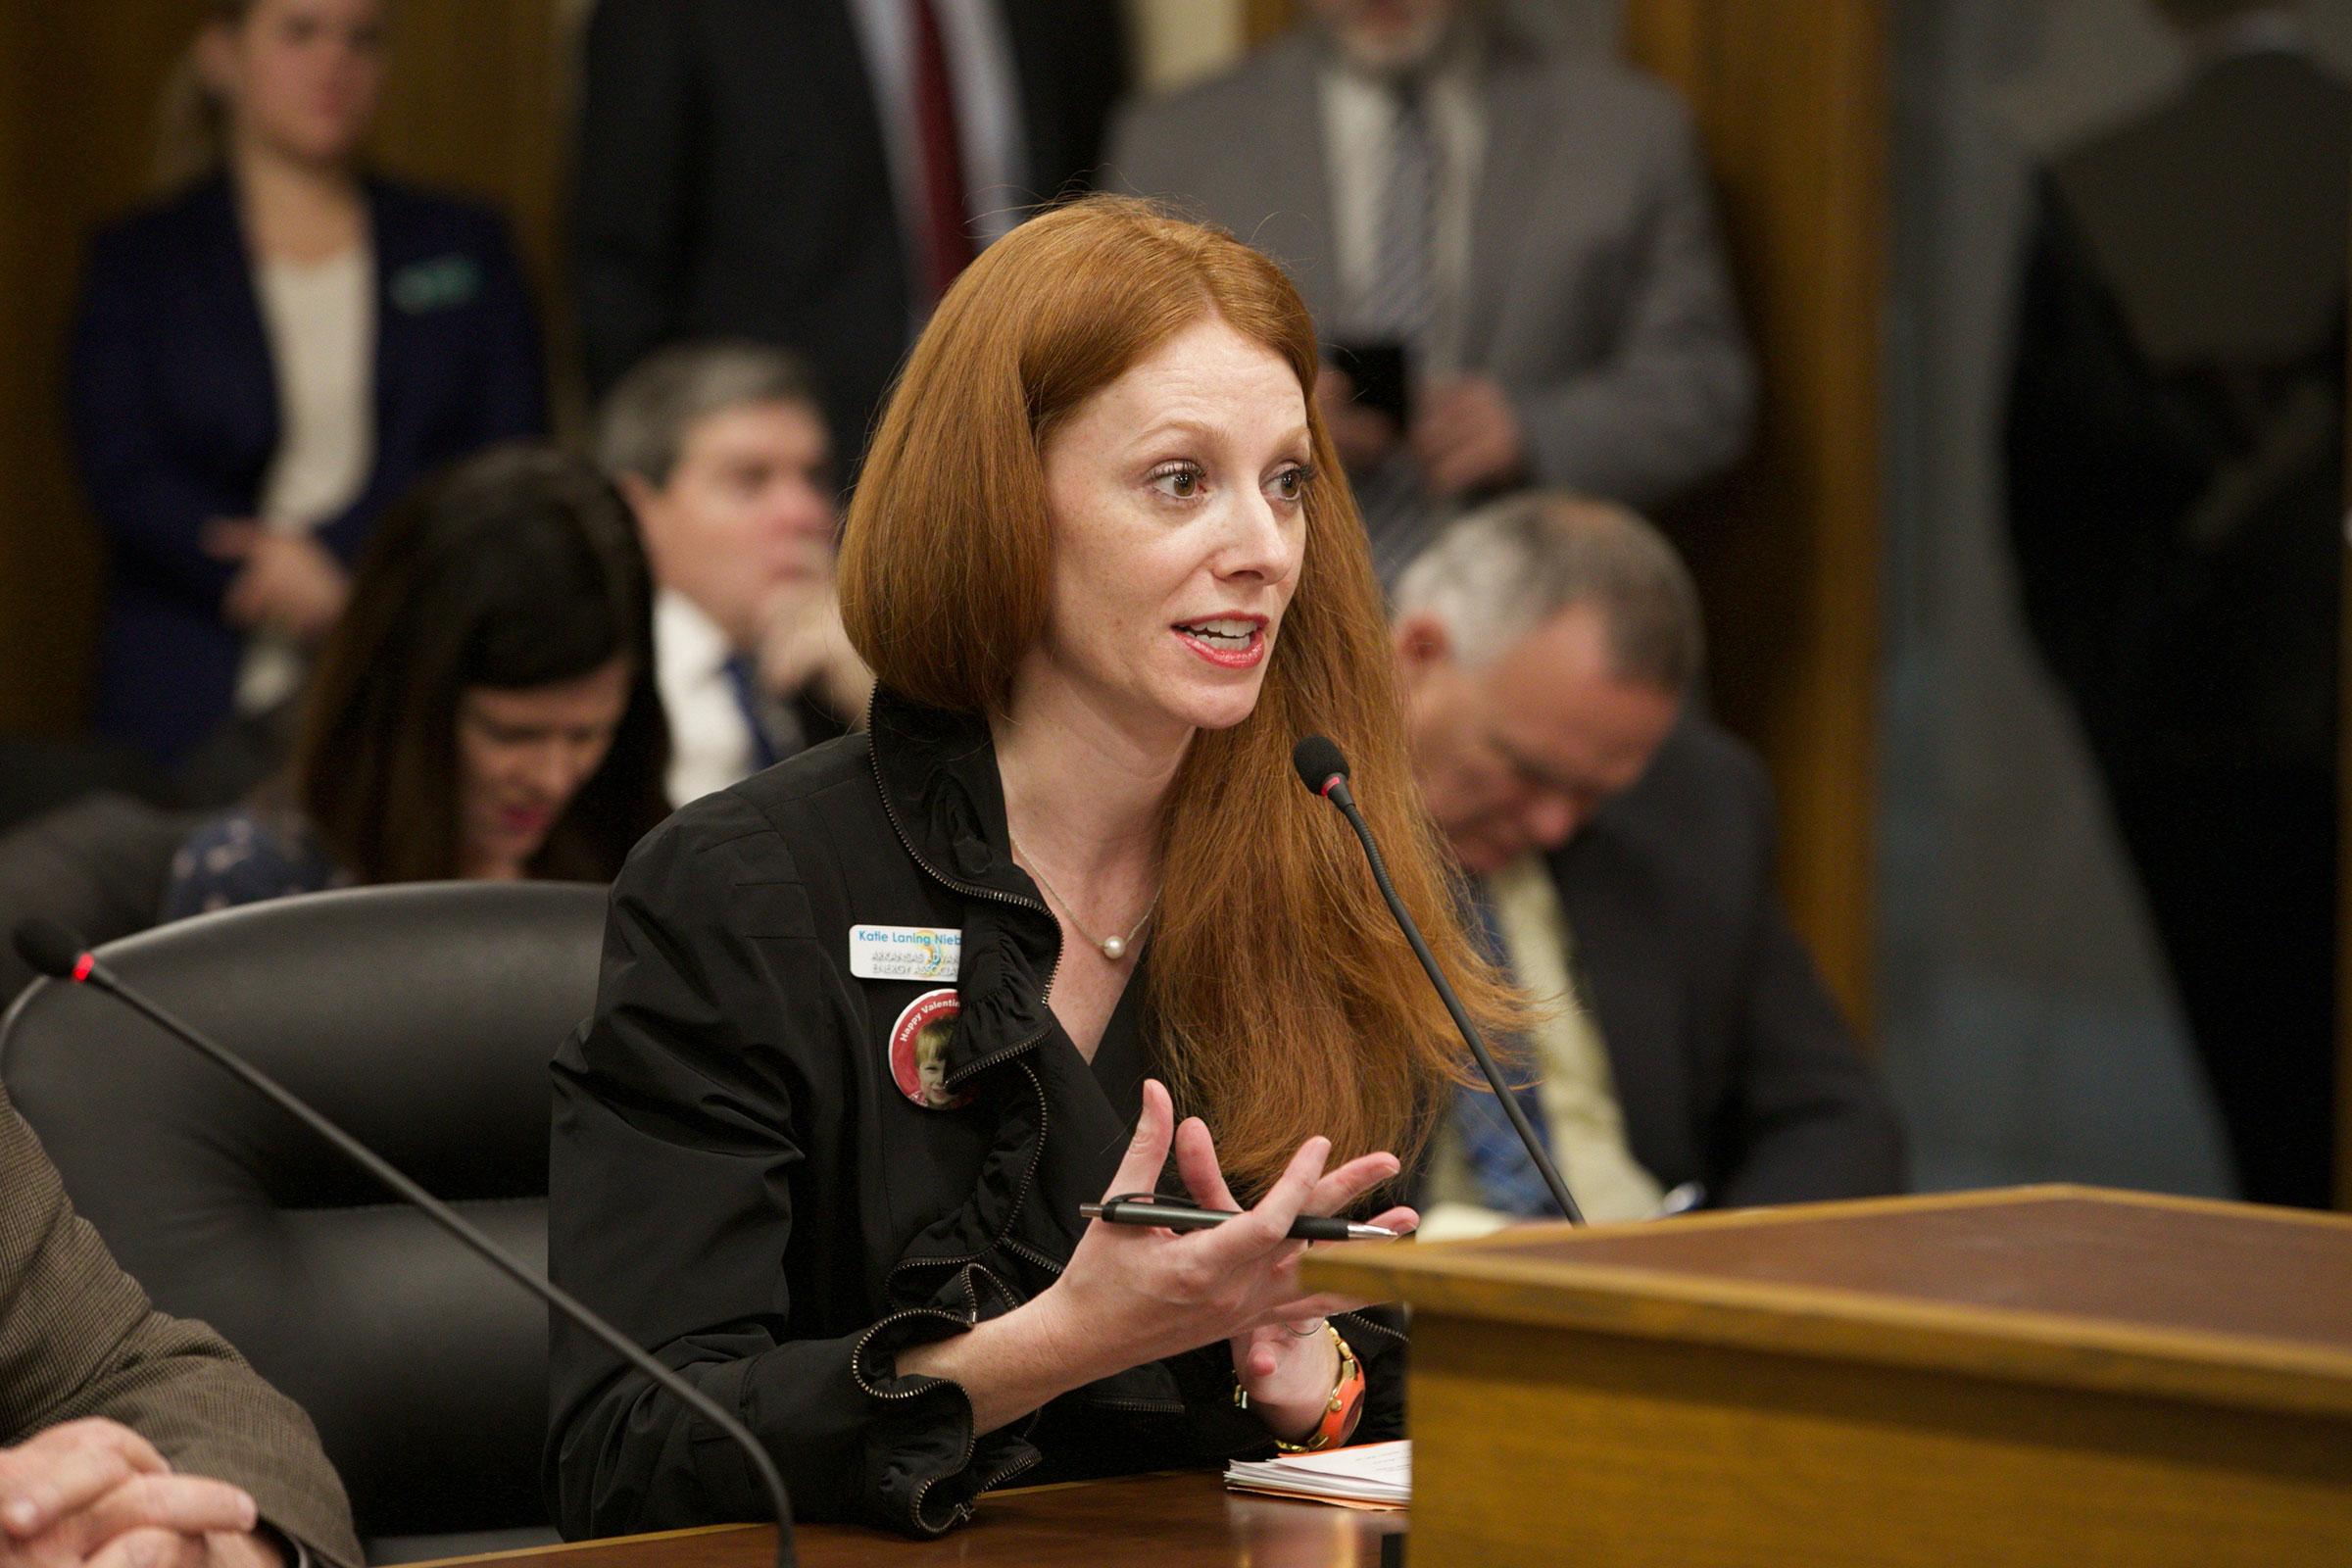 Katie Niebaum, director of Arkansas Advanced Energy Association. Lauren McCullough